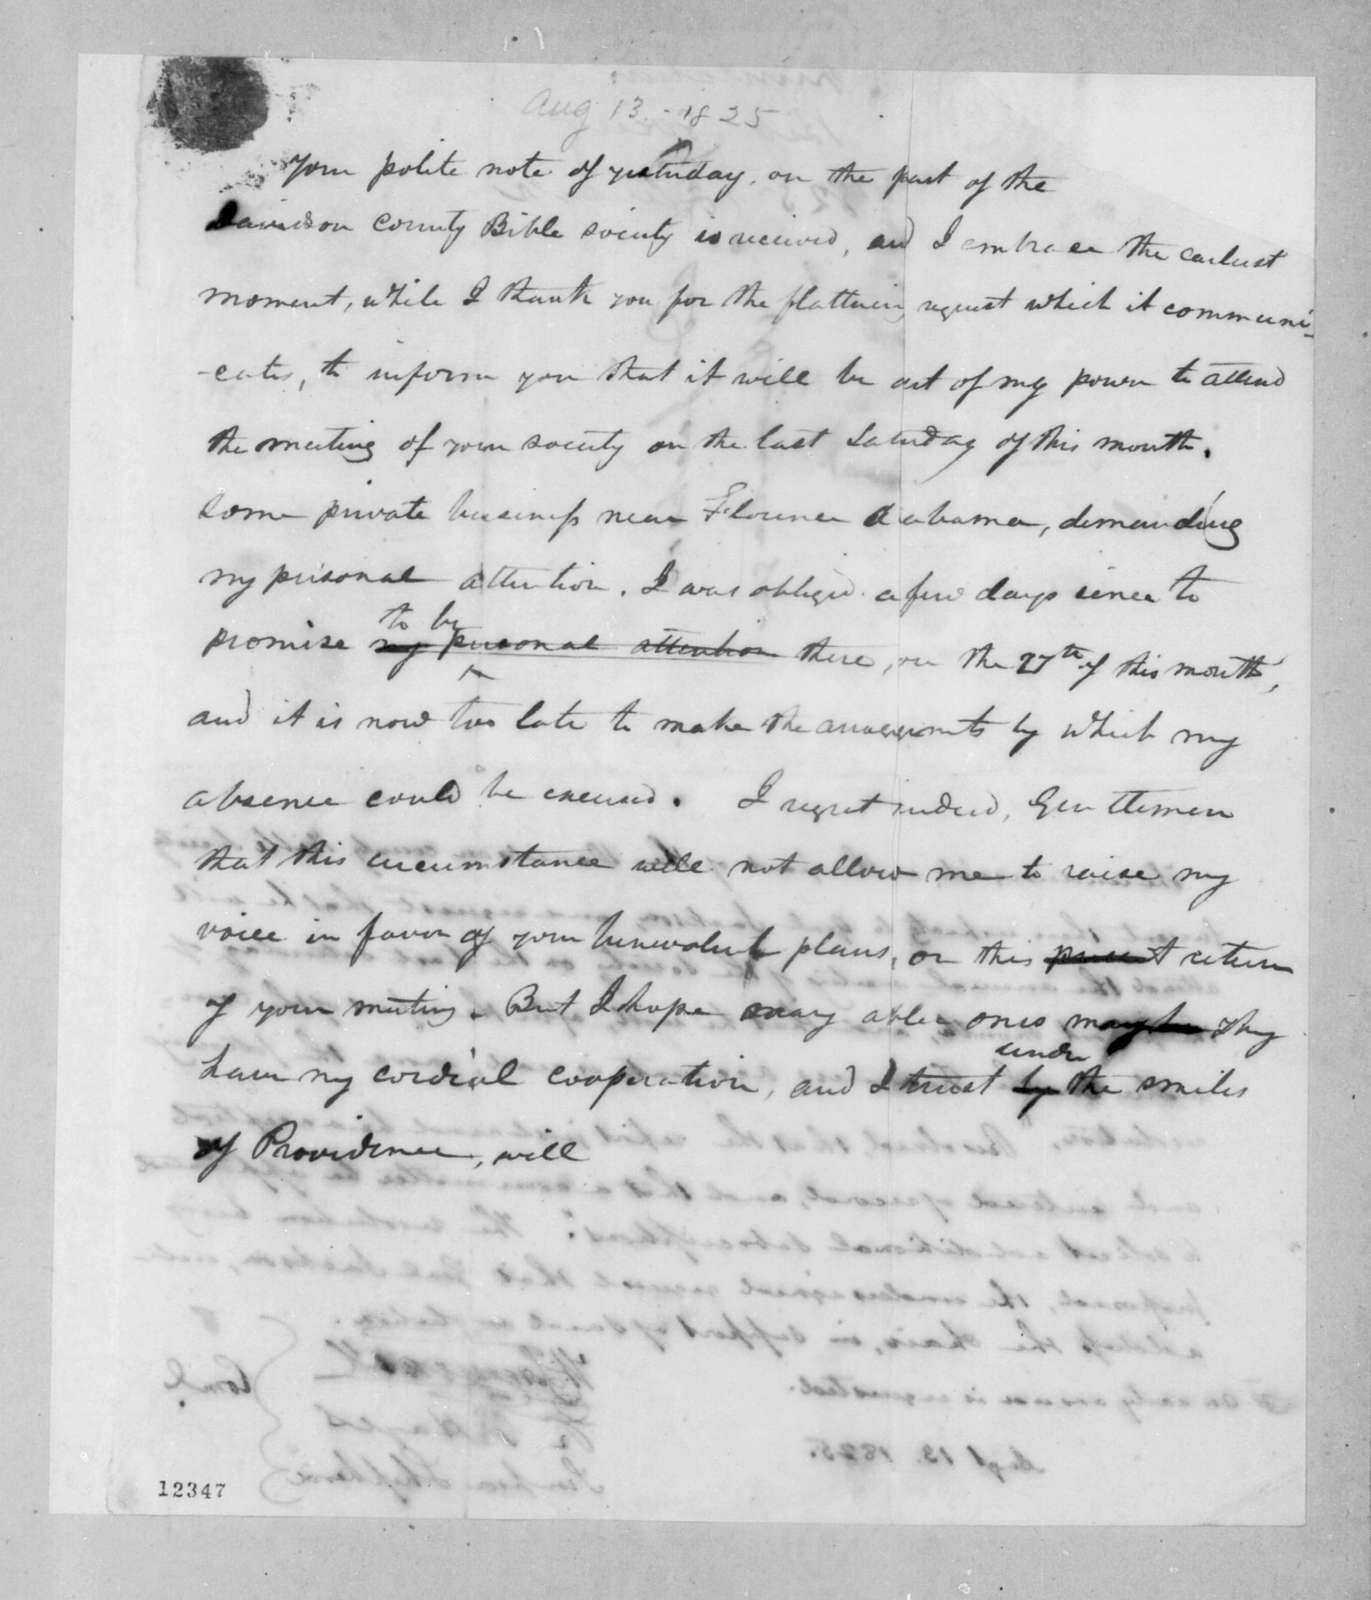 Wilkins Tannehill et al. to Andrew Jackson, August 13, 1825